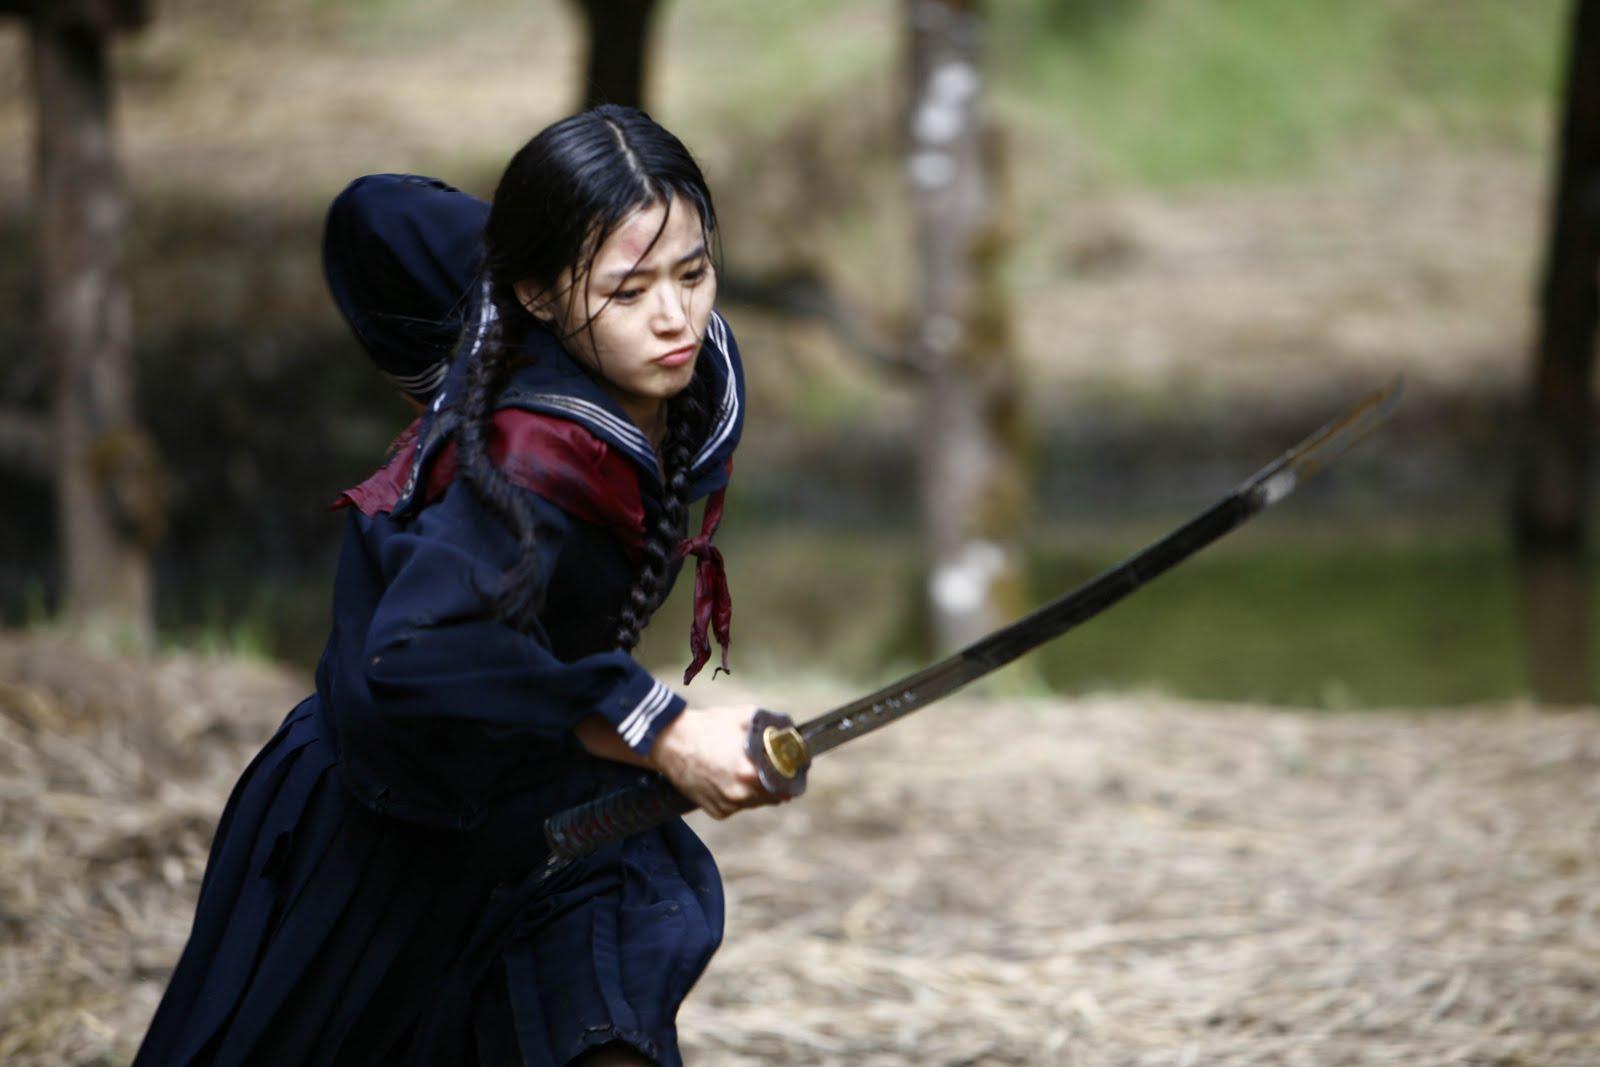 Girls with sword samurai girls hd wallpapers desktop - Girl with sword wallpaper ...